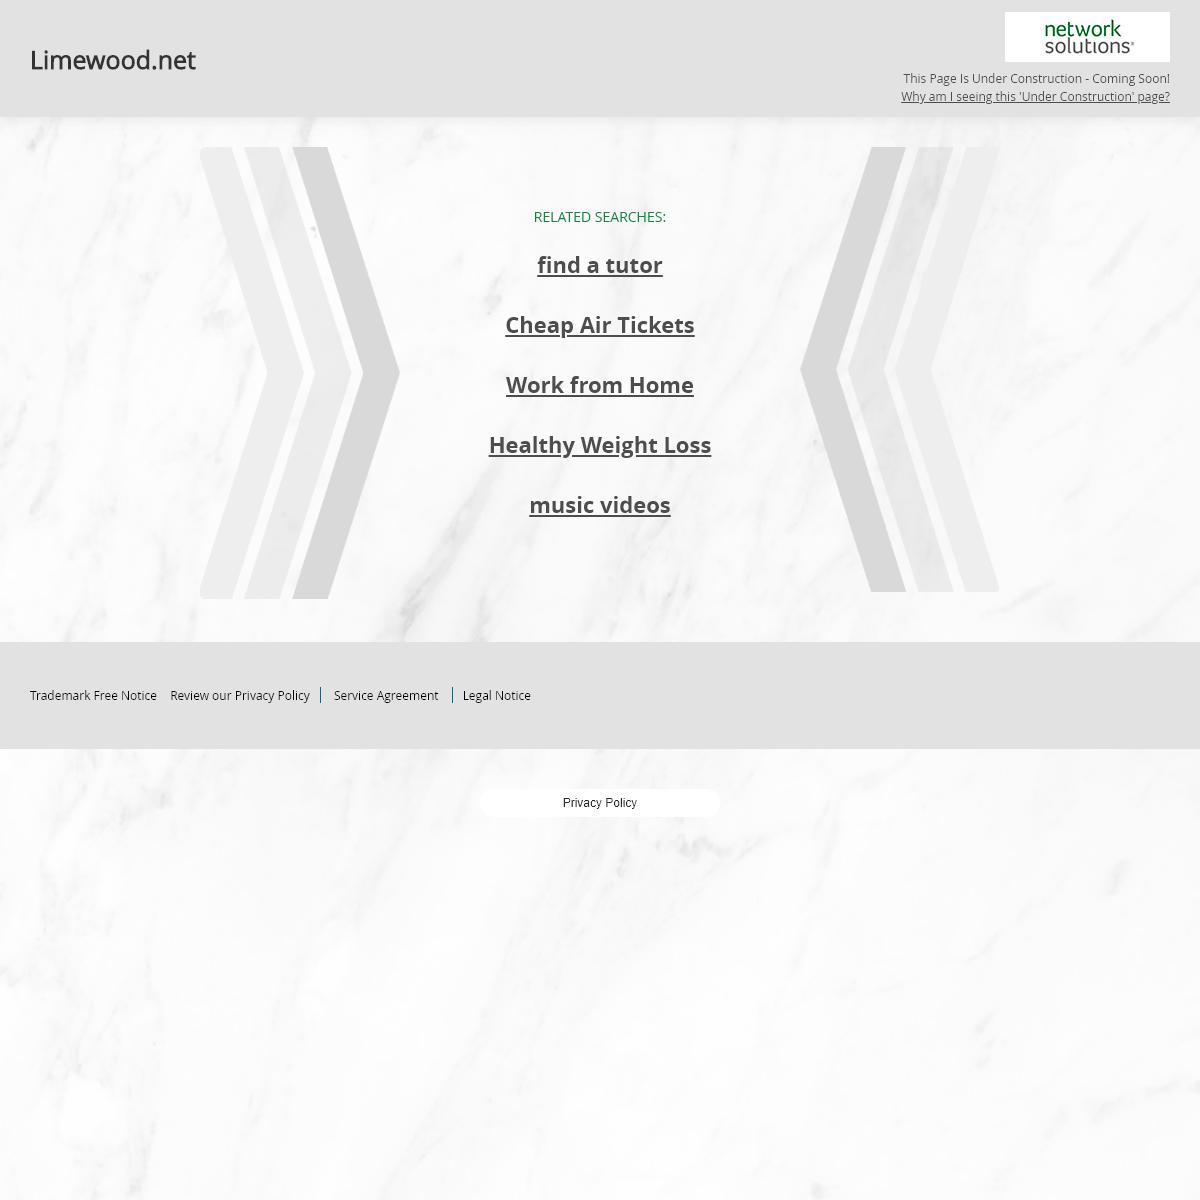 Limewood.net